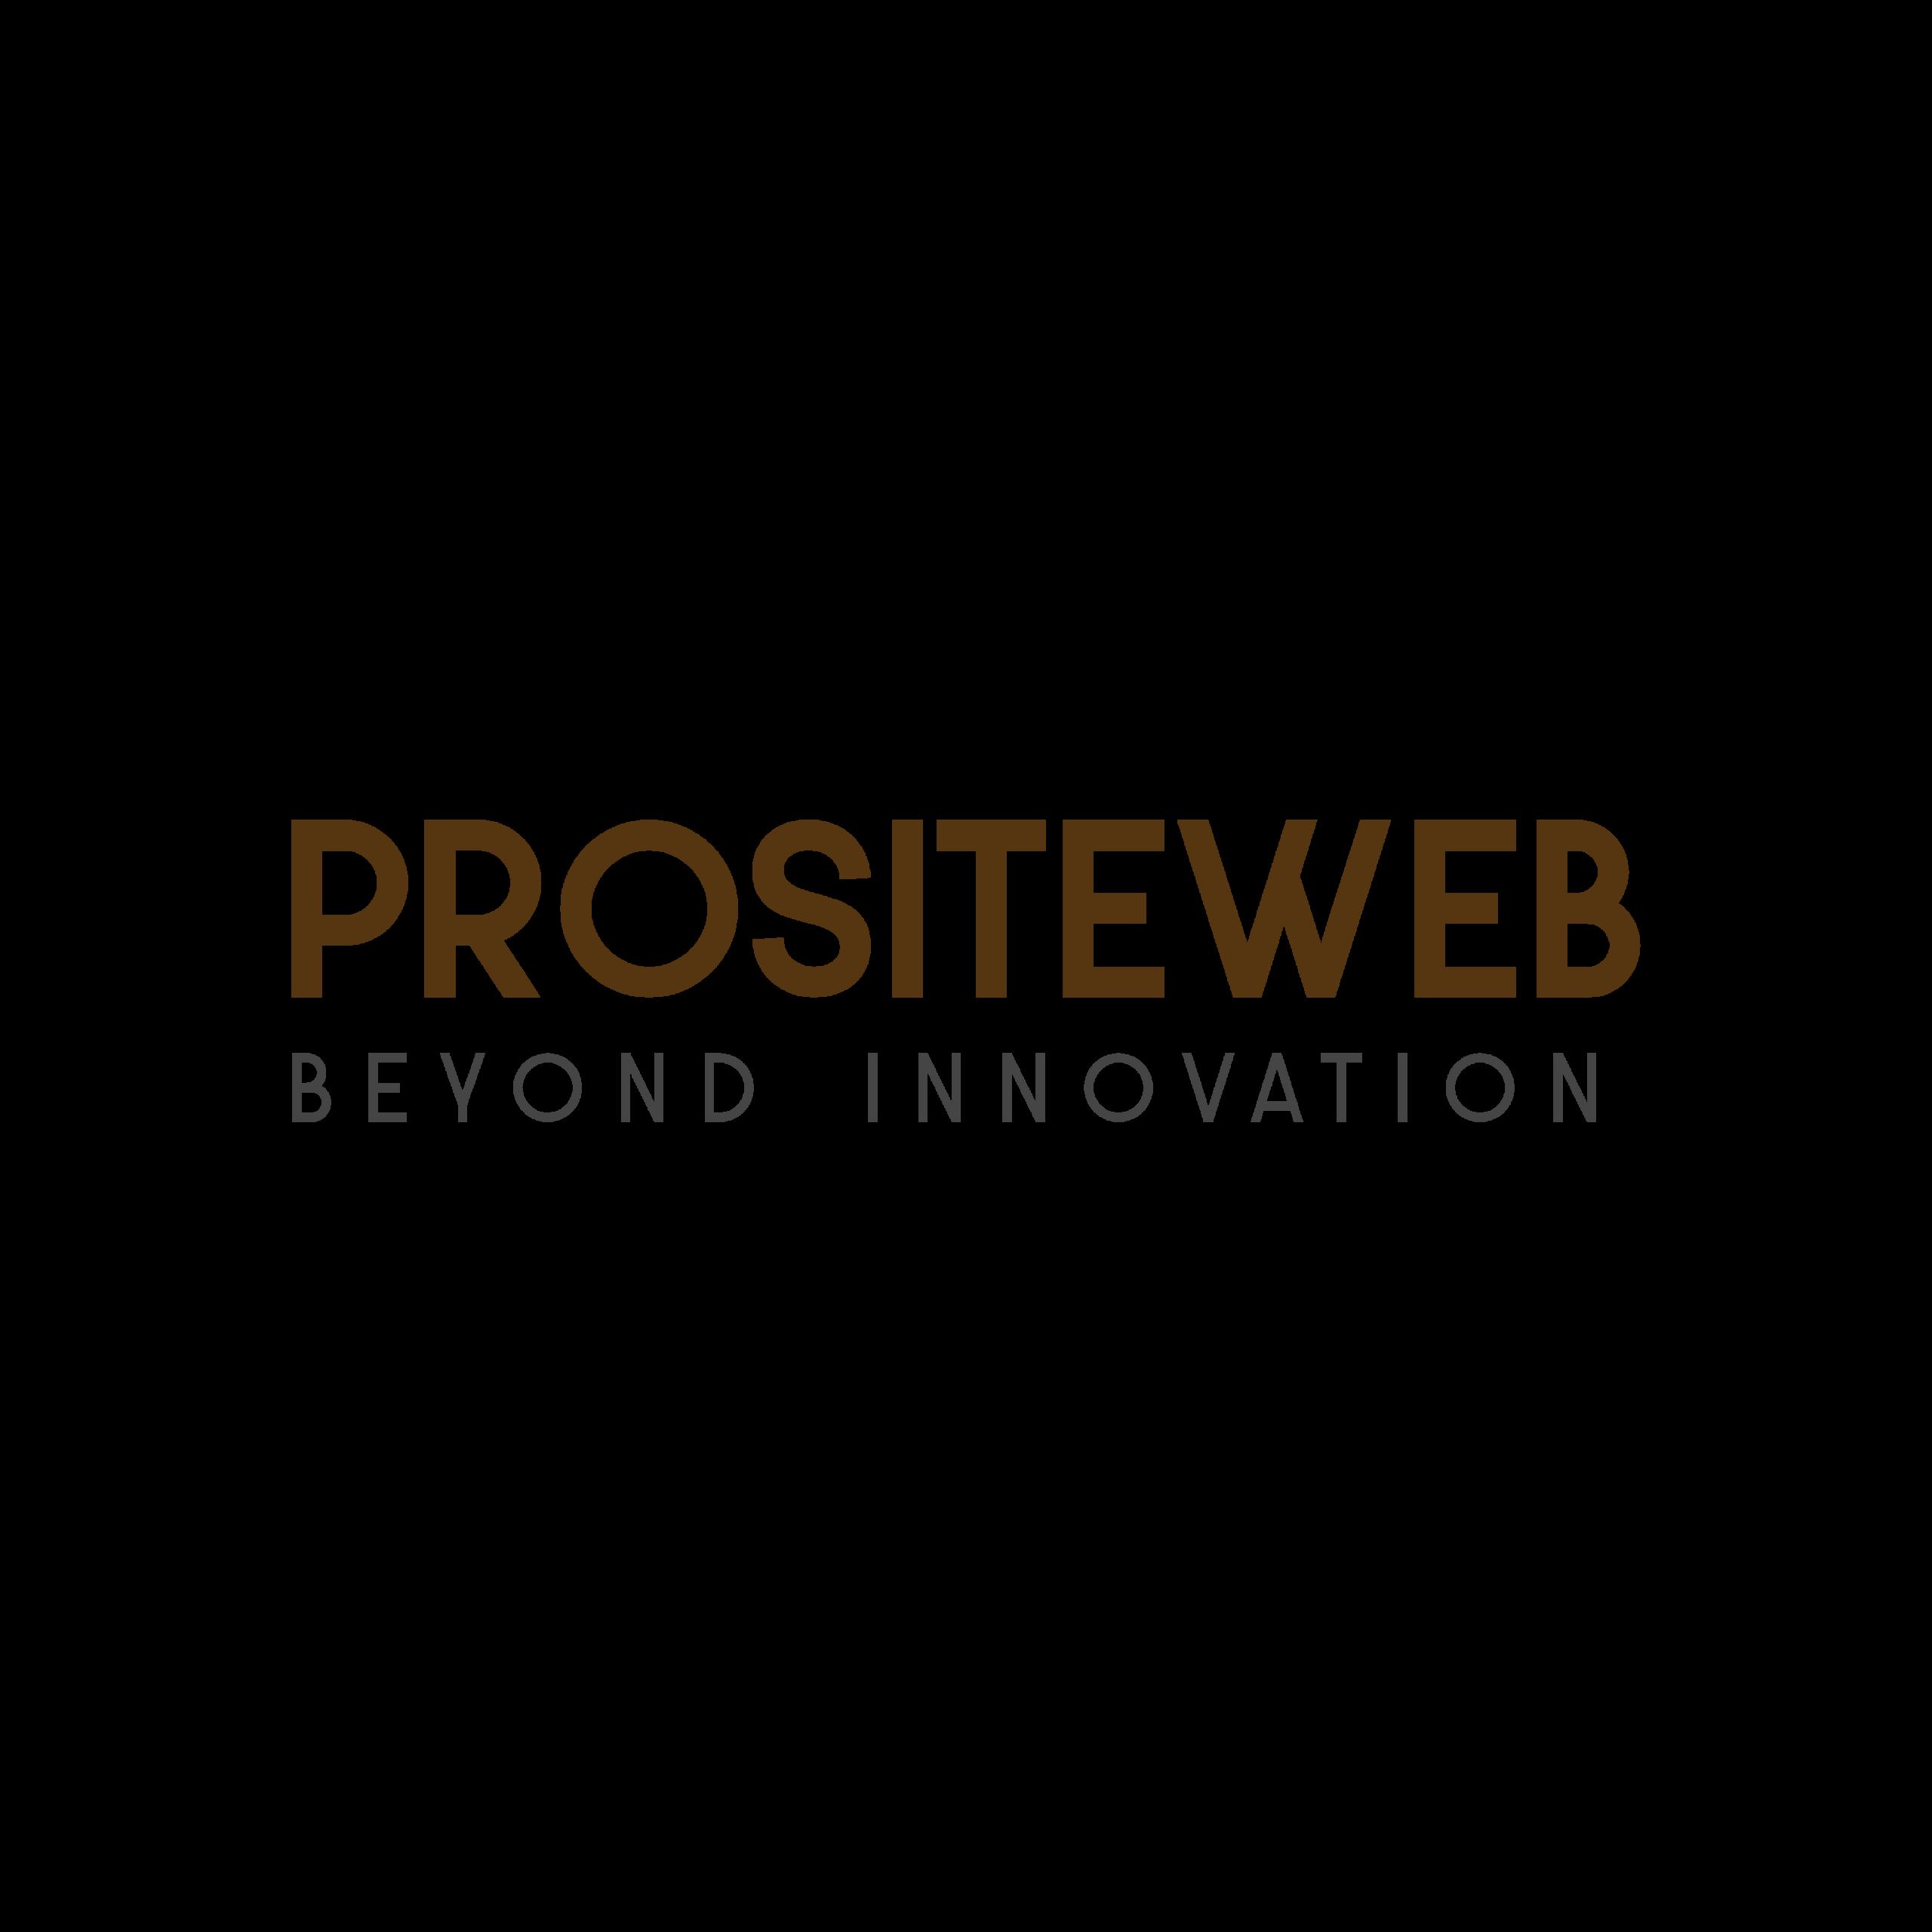 https://www.prositeweb.ca/wp-content/uploads/2020/11/prositeweb-inc-innovation.png